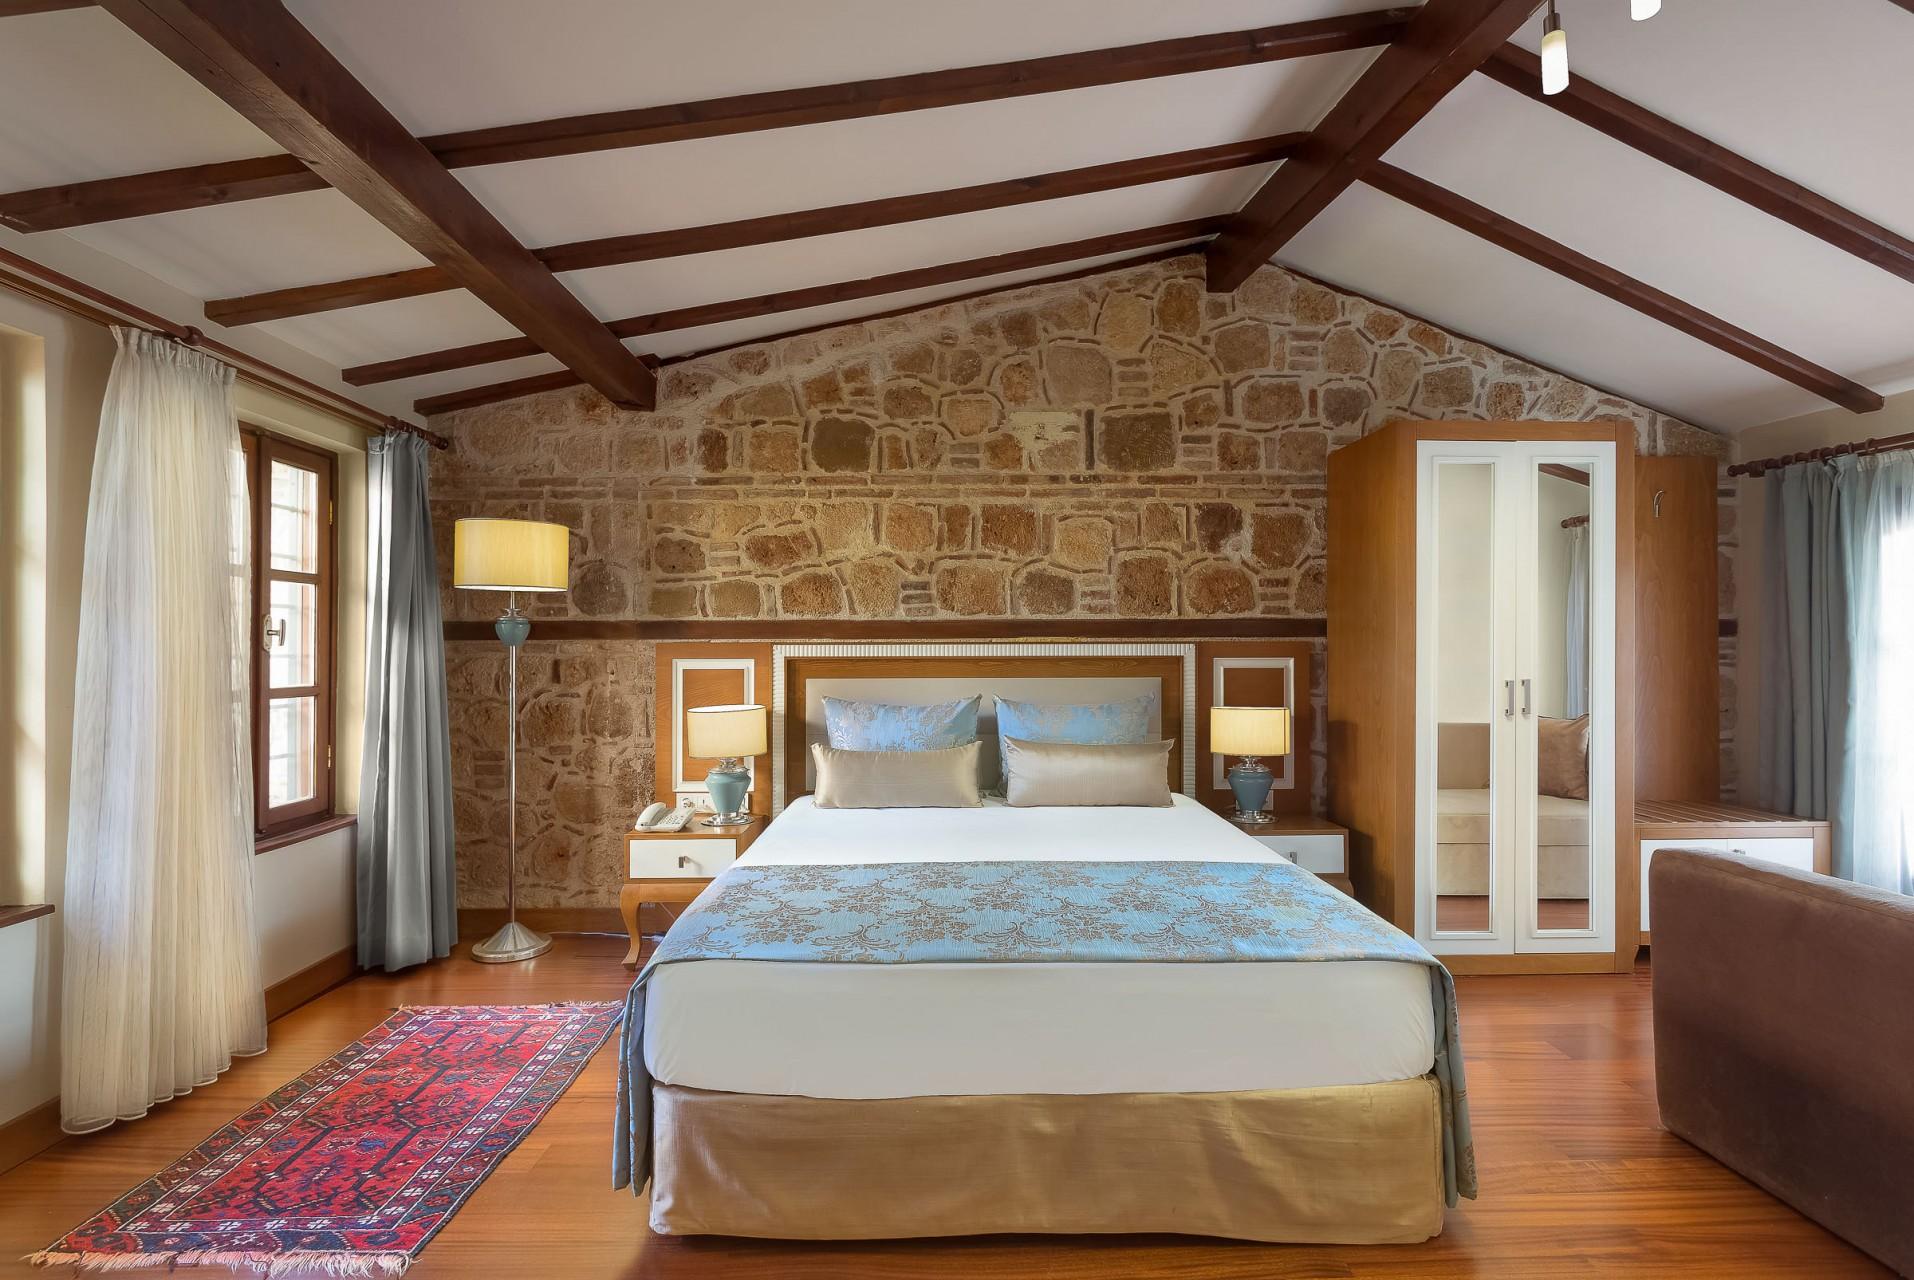 Best Architecture Photographer Thailand   Dogan Hotel Antalya Kaleici Room Photography